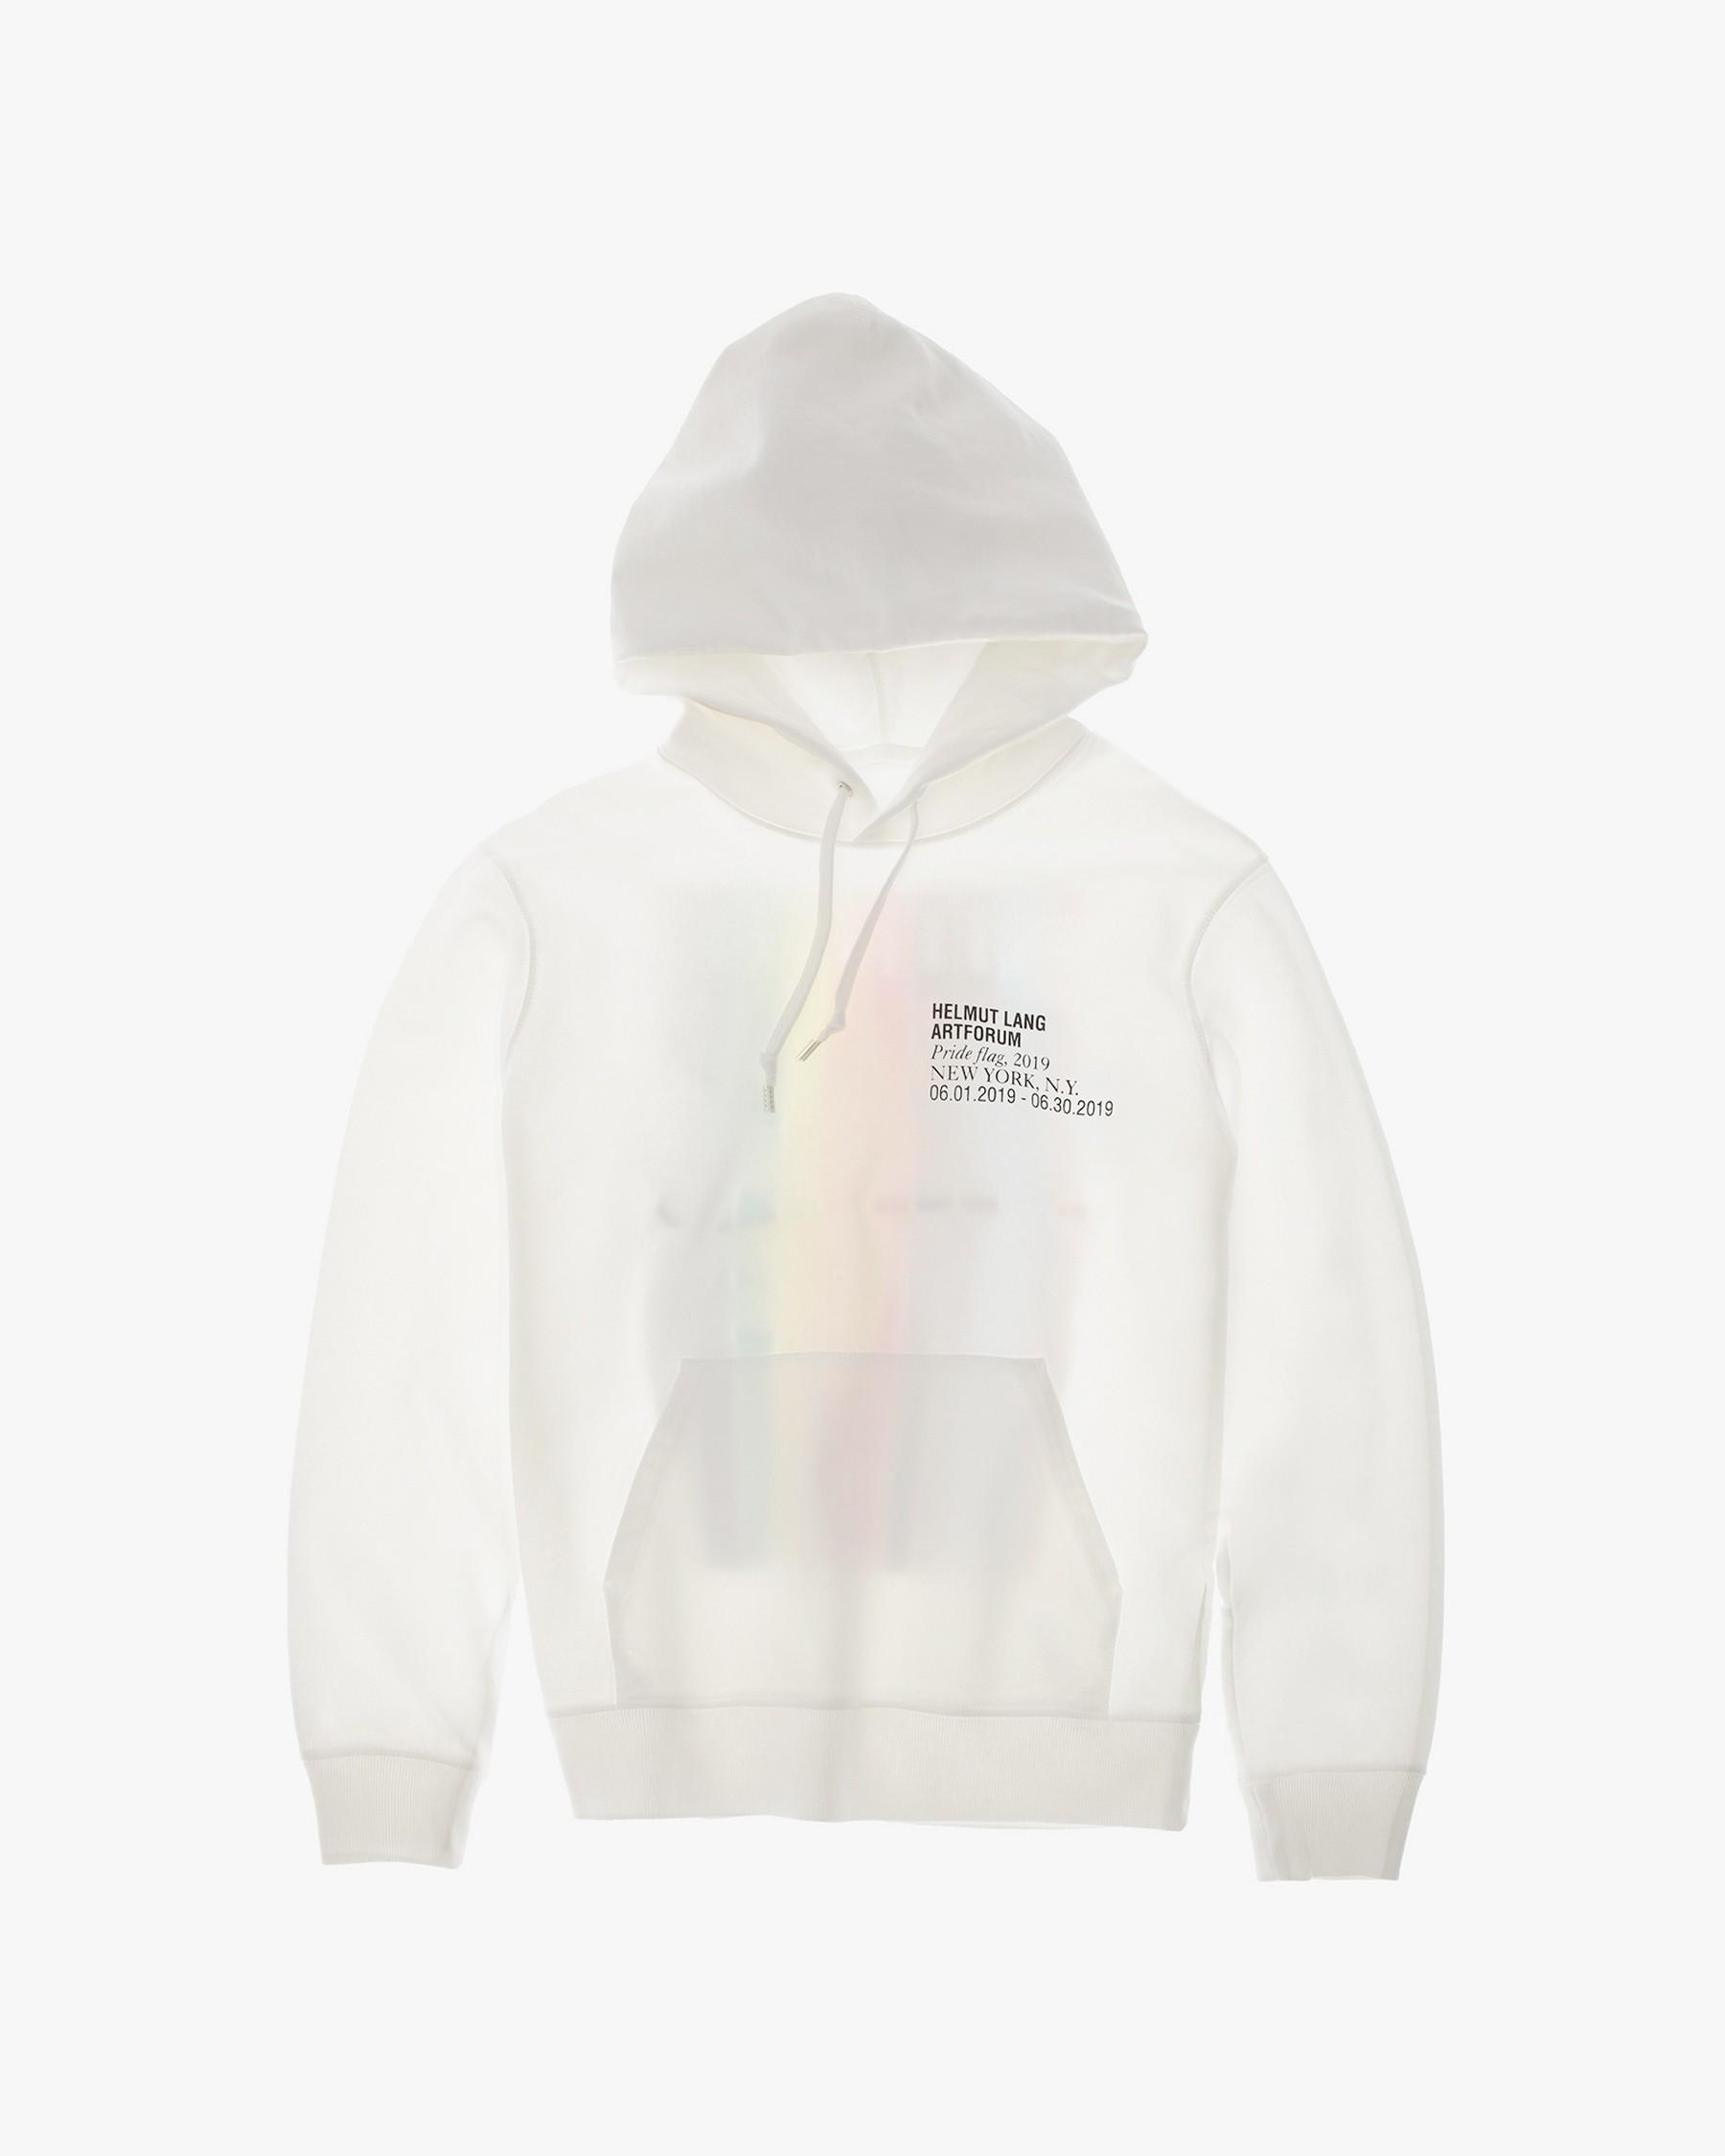 Limited Edition Artforum Sweatshirt by Helmut Lang